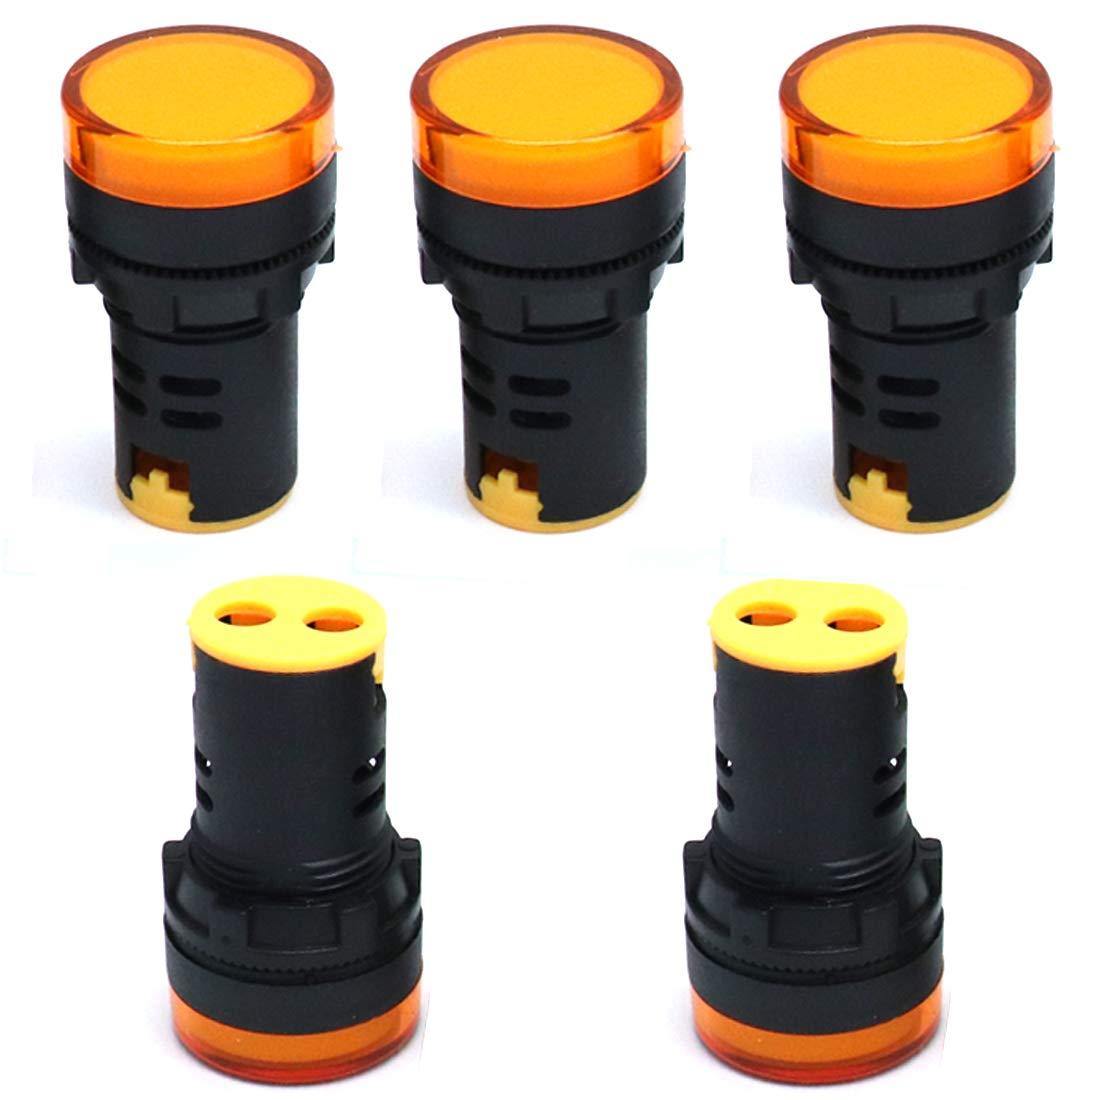 ZXHAO AC 110V 20mA Yellow LED Pilot Light Panel Indicator Flush Panel Mount 7//8 22mm AD16-22DS 5pcs